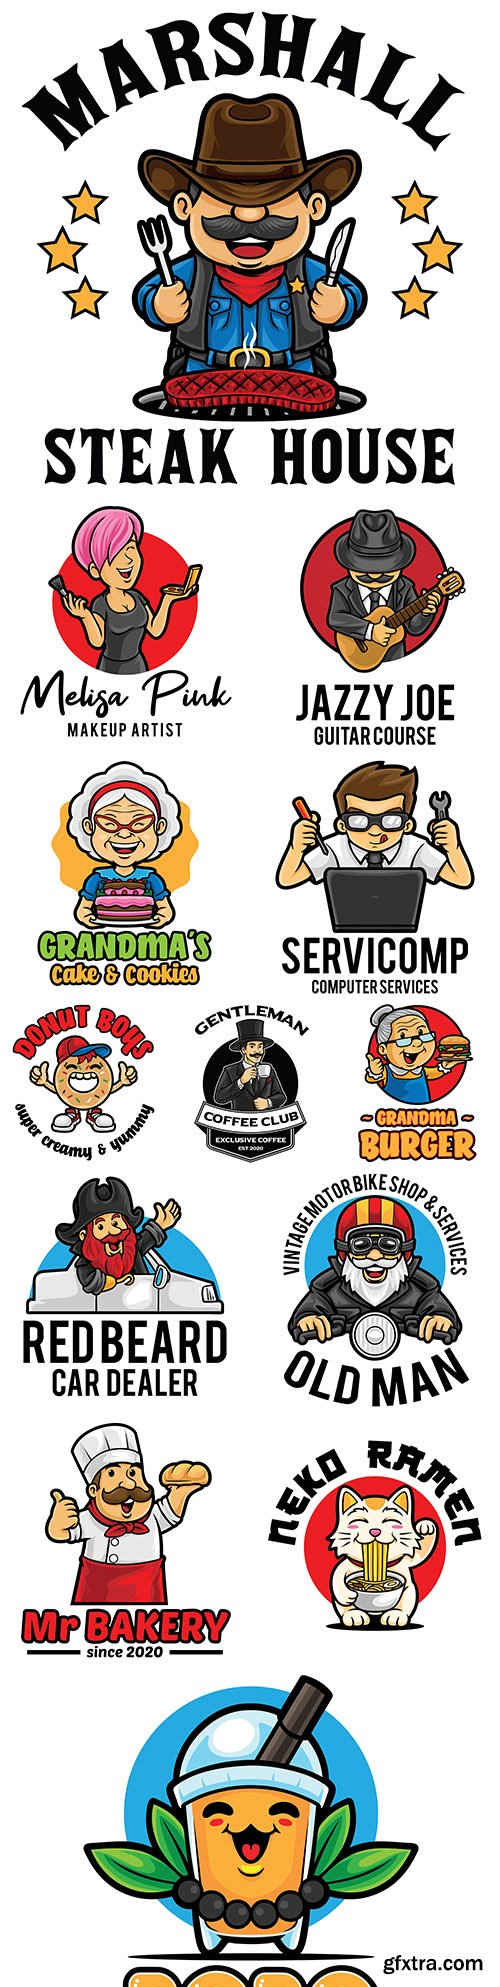 Emblem mascot and Brand name logos design 11